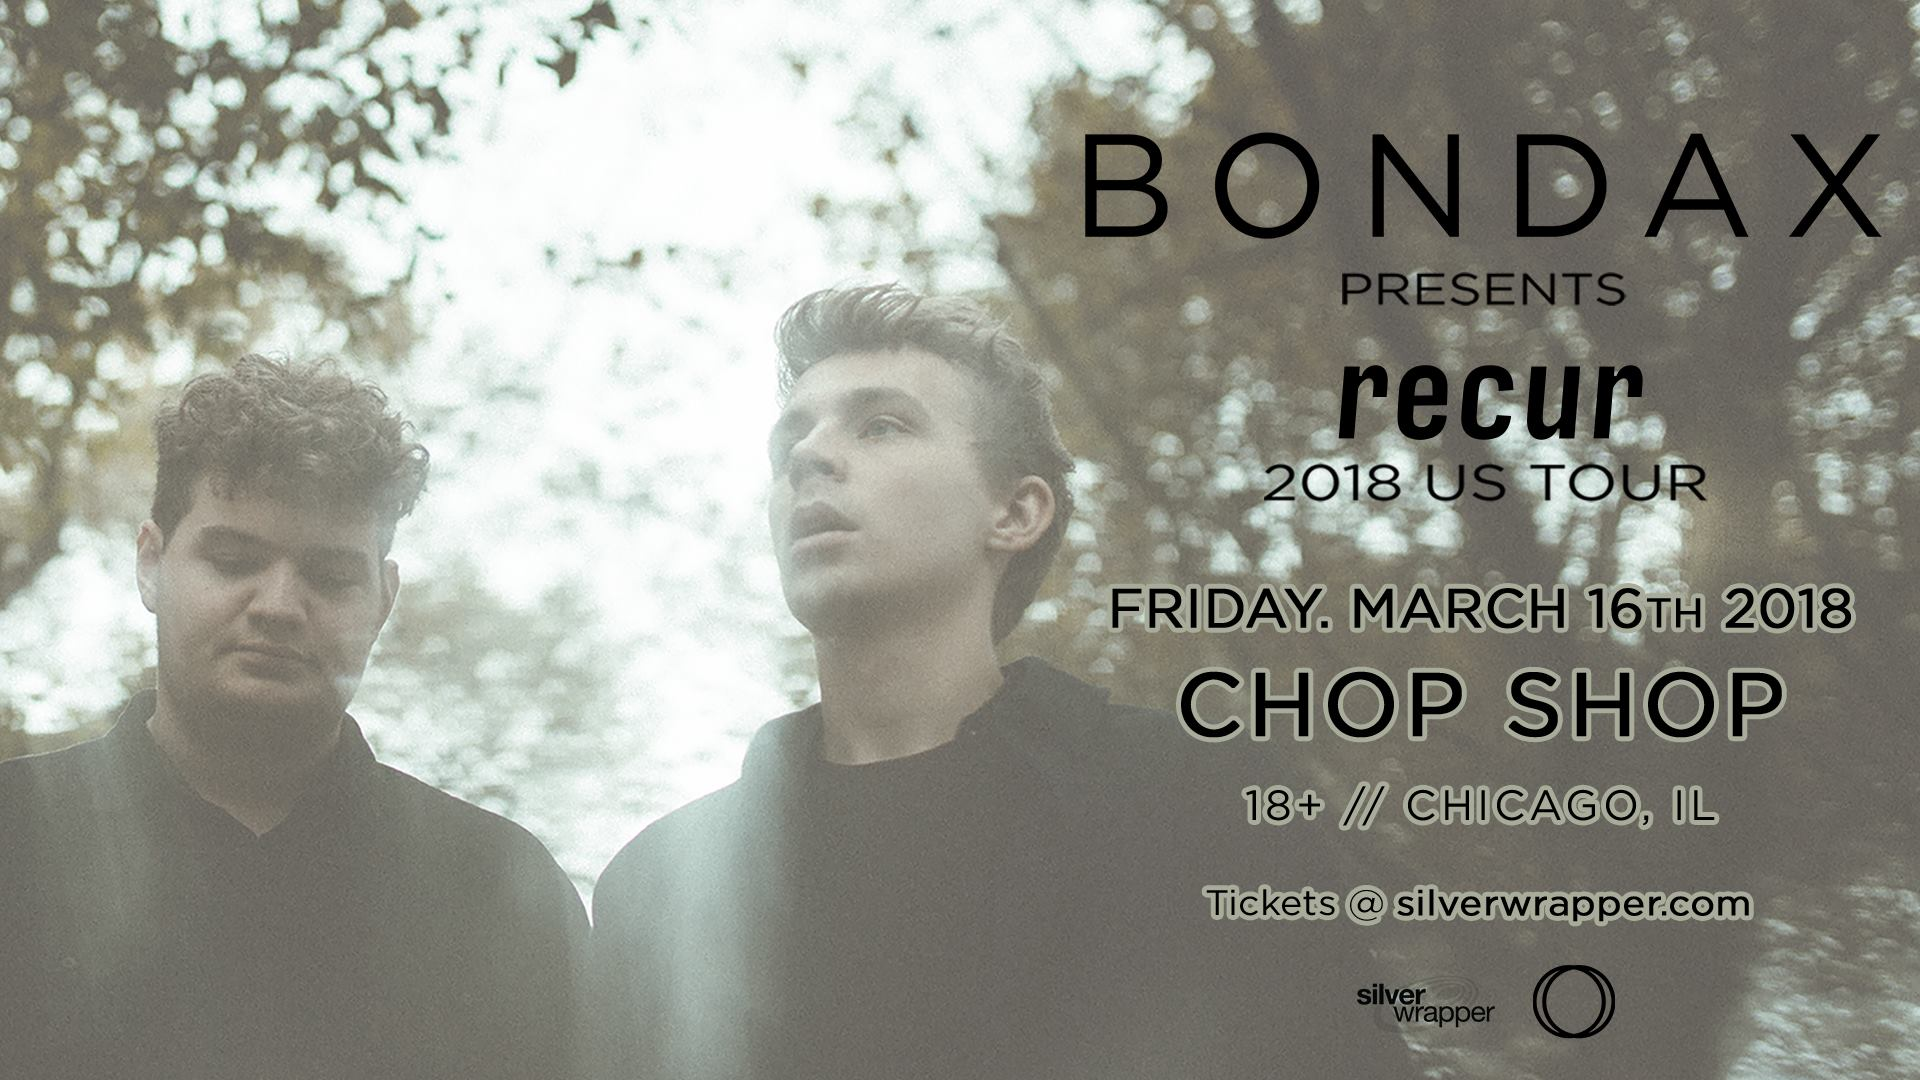 Bondax_Chicago 3-16.jpg